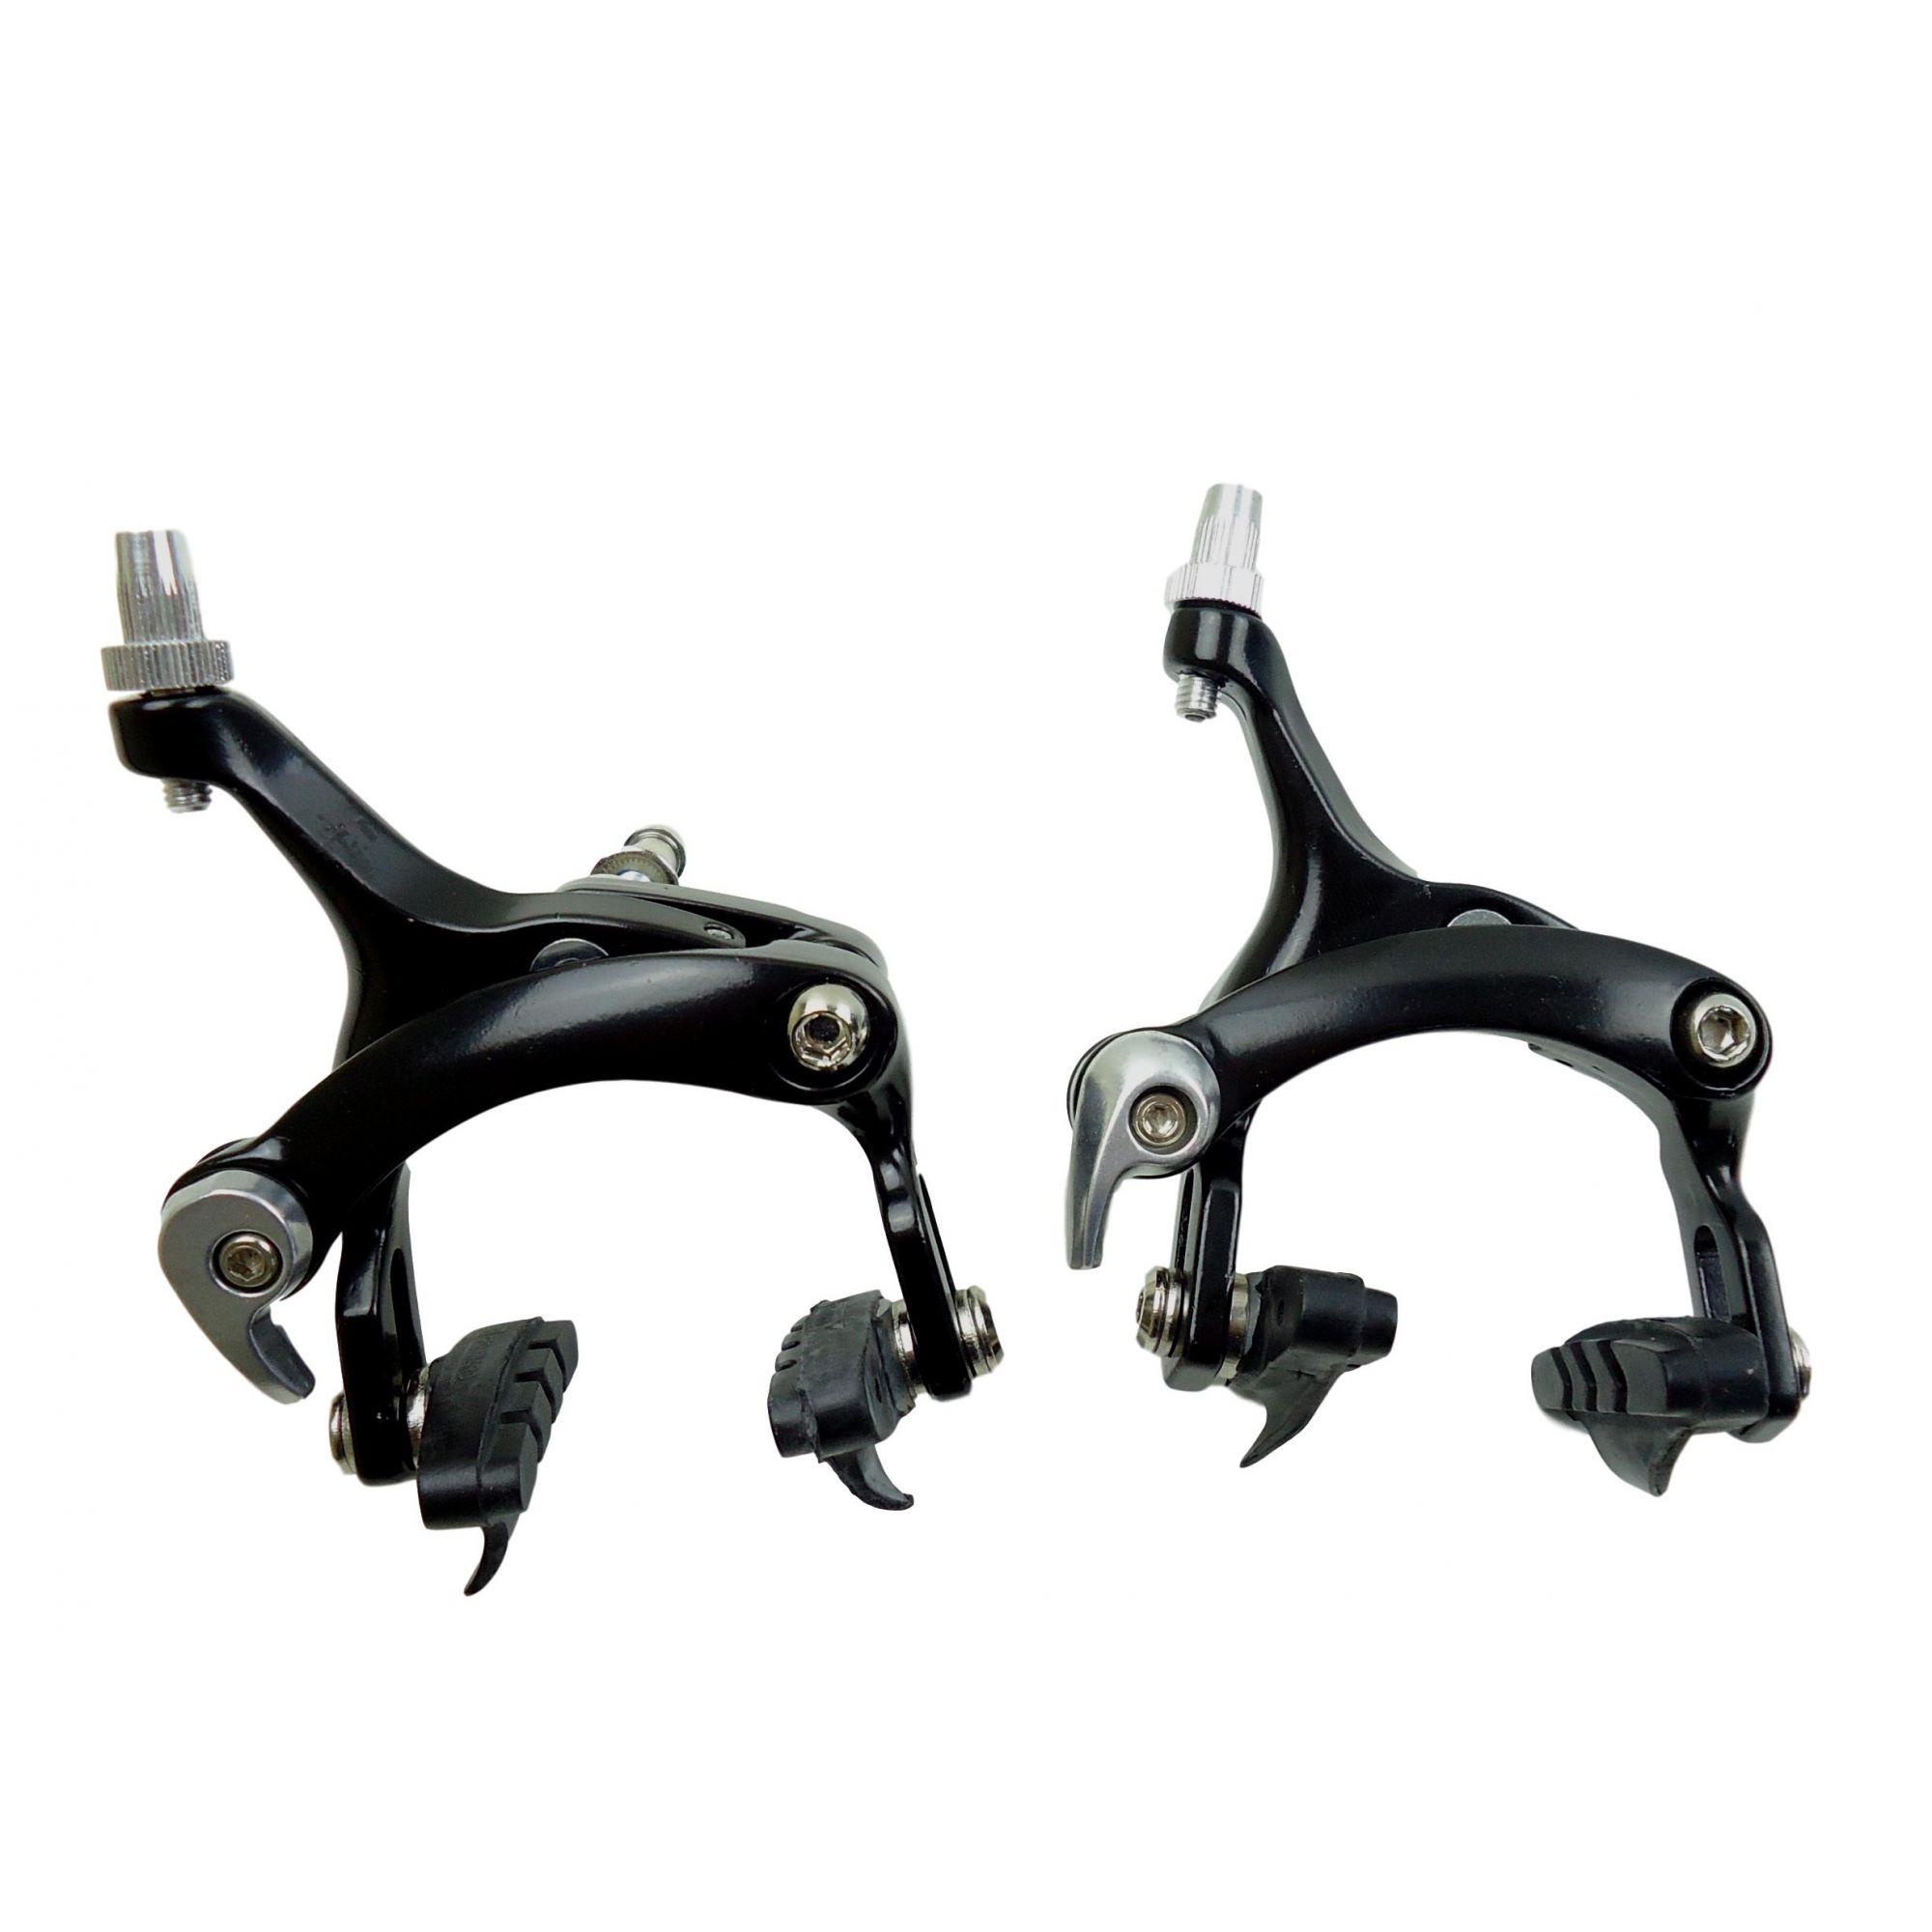 Par de Freios Tektro para Bicicletas Speed Tipo Ferradura em Aluminio